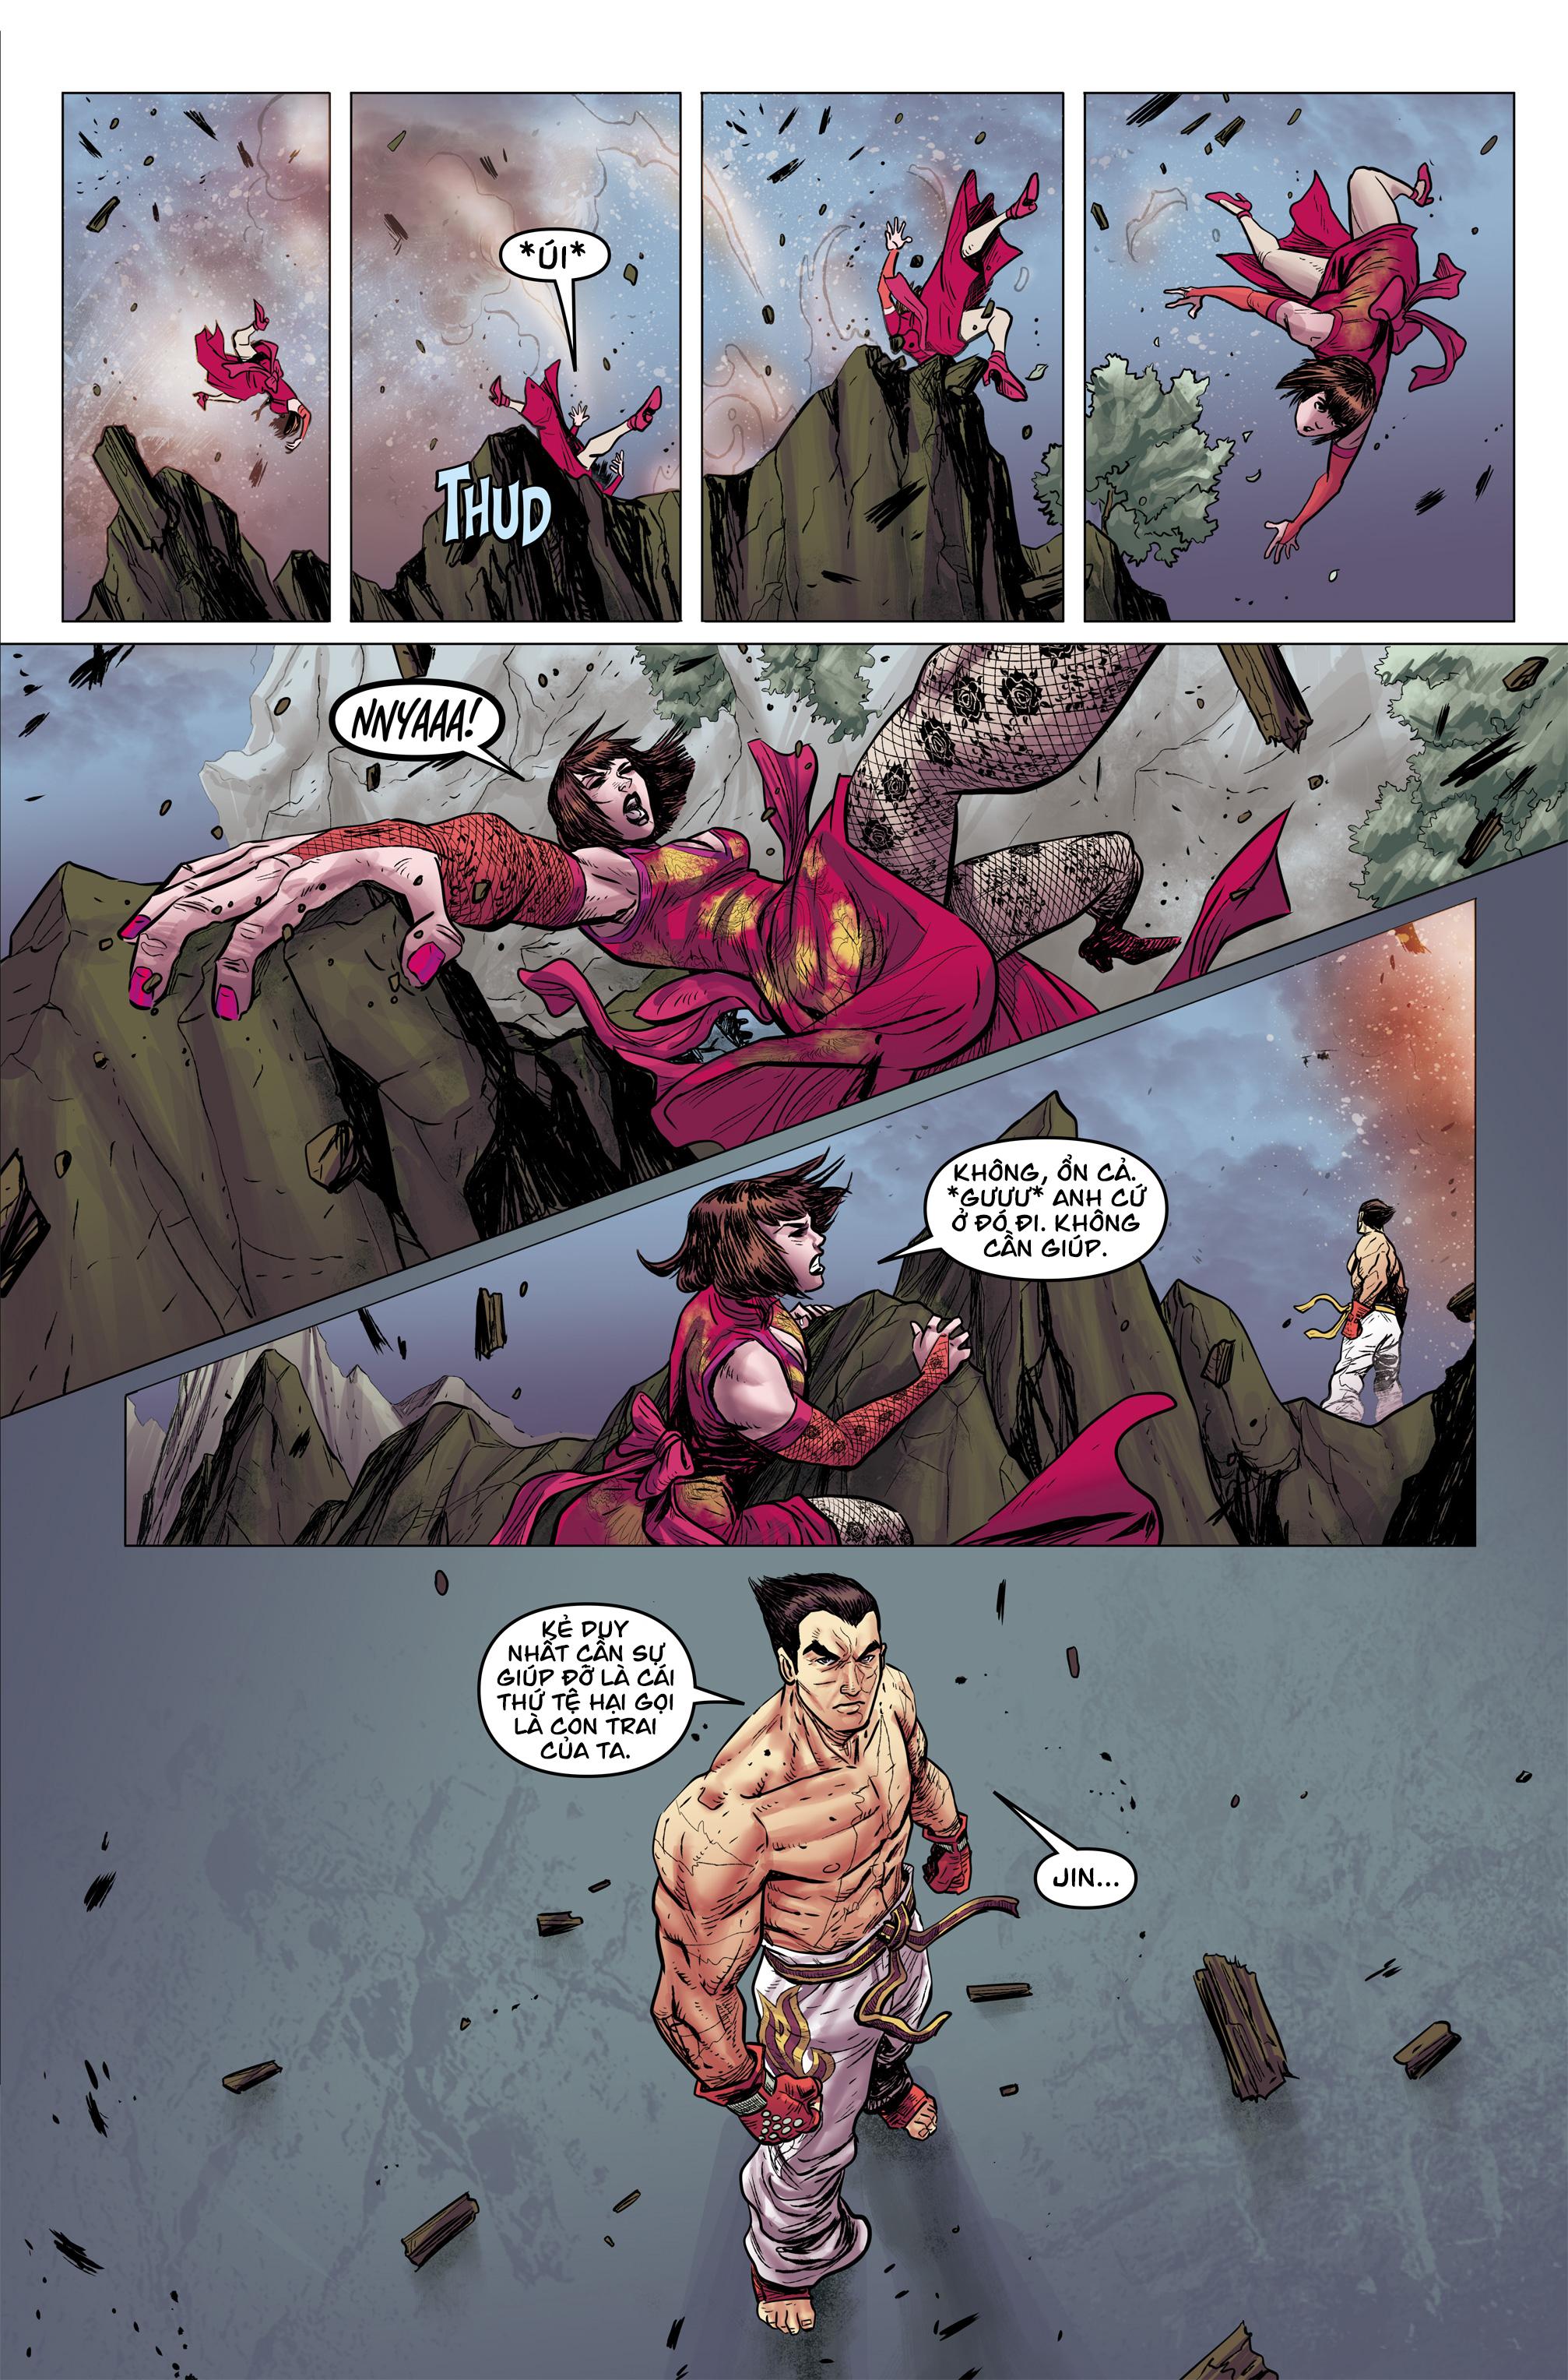 Tekken - Thiết Quyền Chapter 2b - Hamtruyen.vn